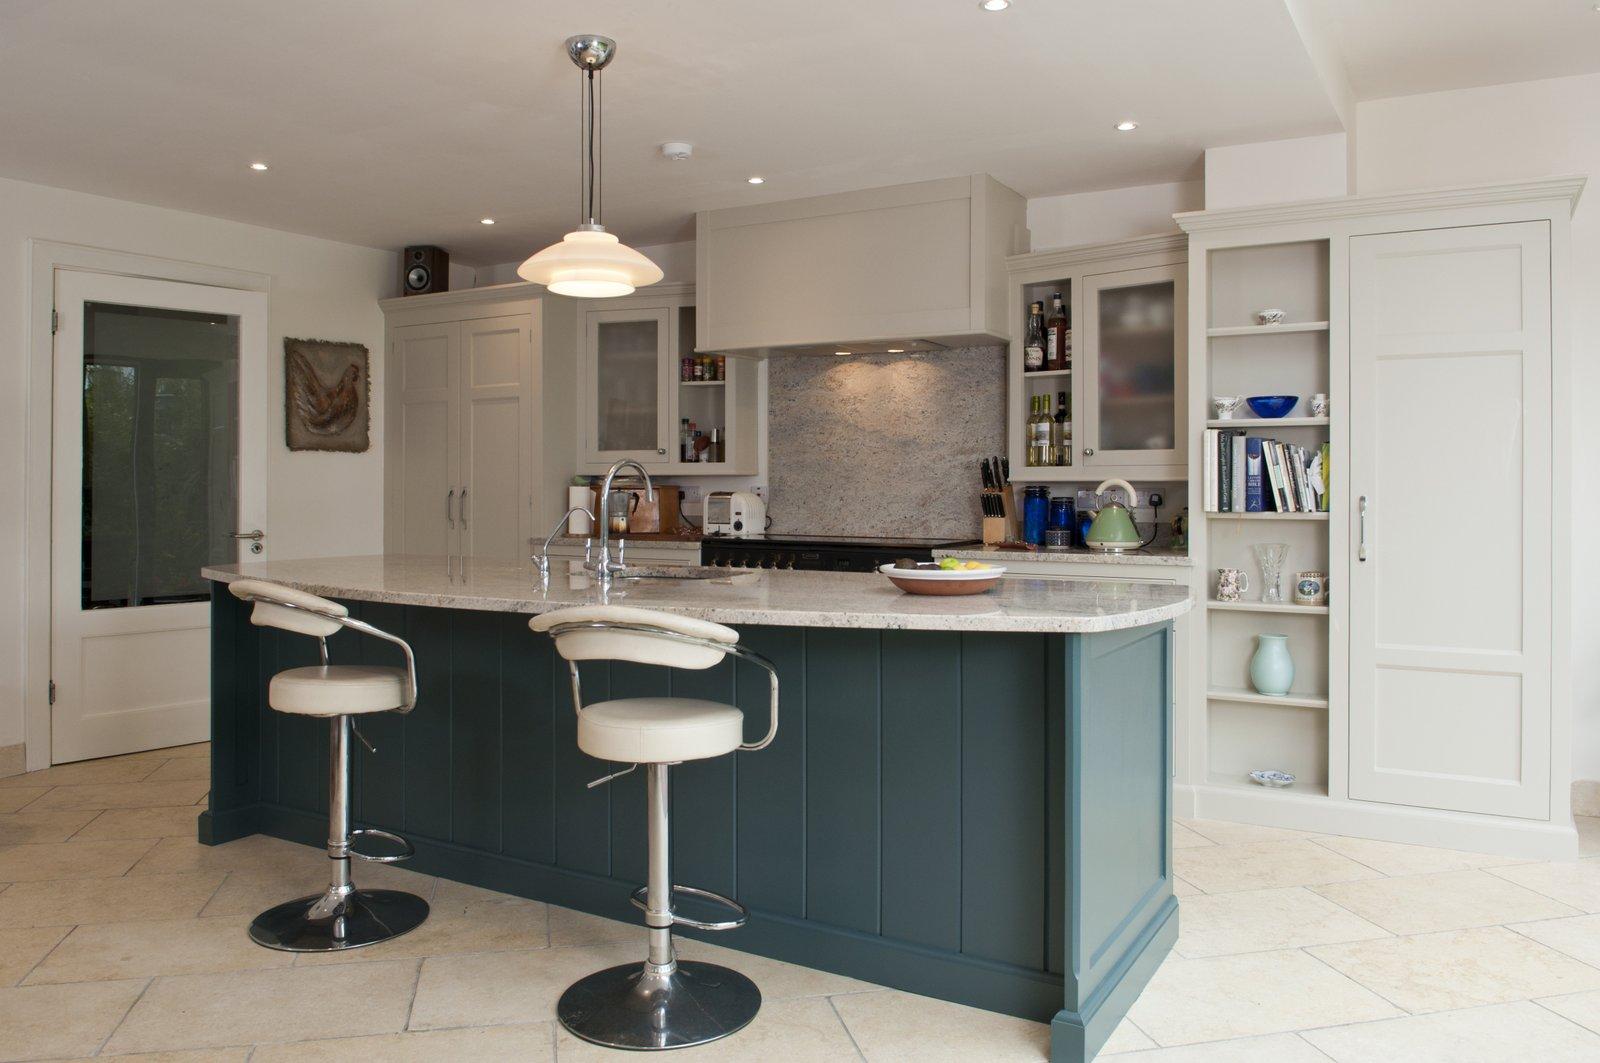 Kilcock, Bespoke handmade kitchens, Talisman Woodworks